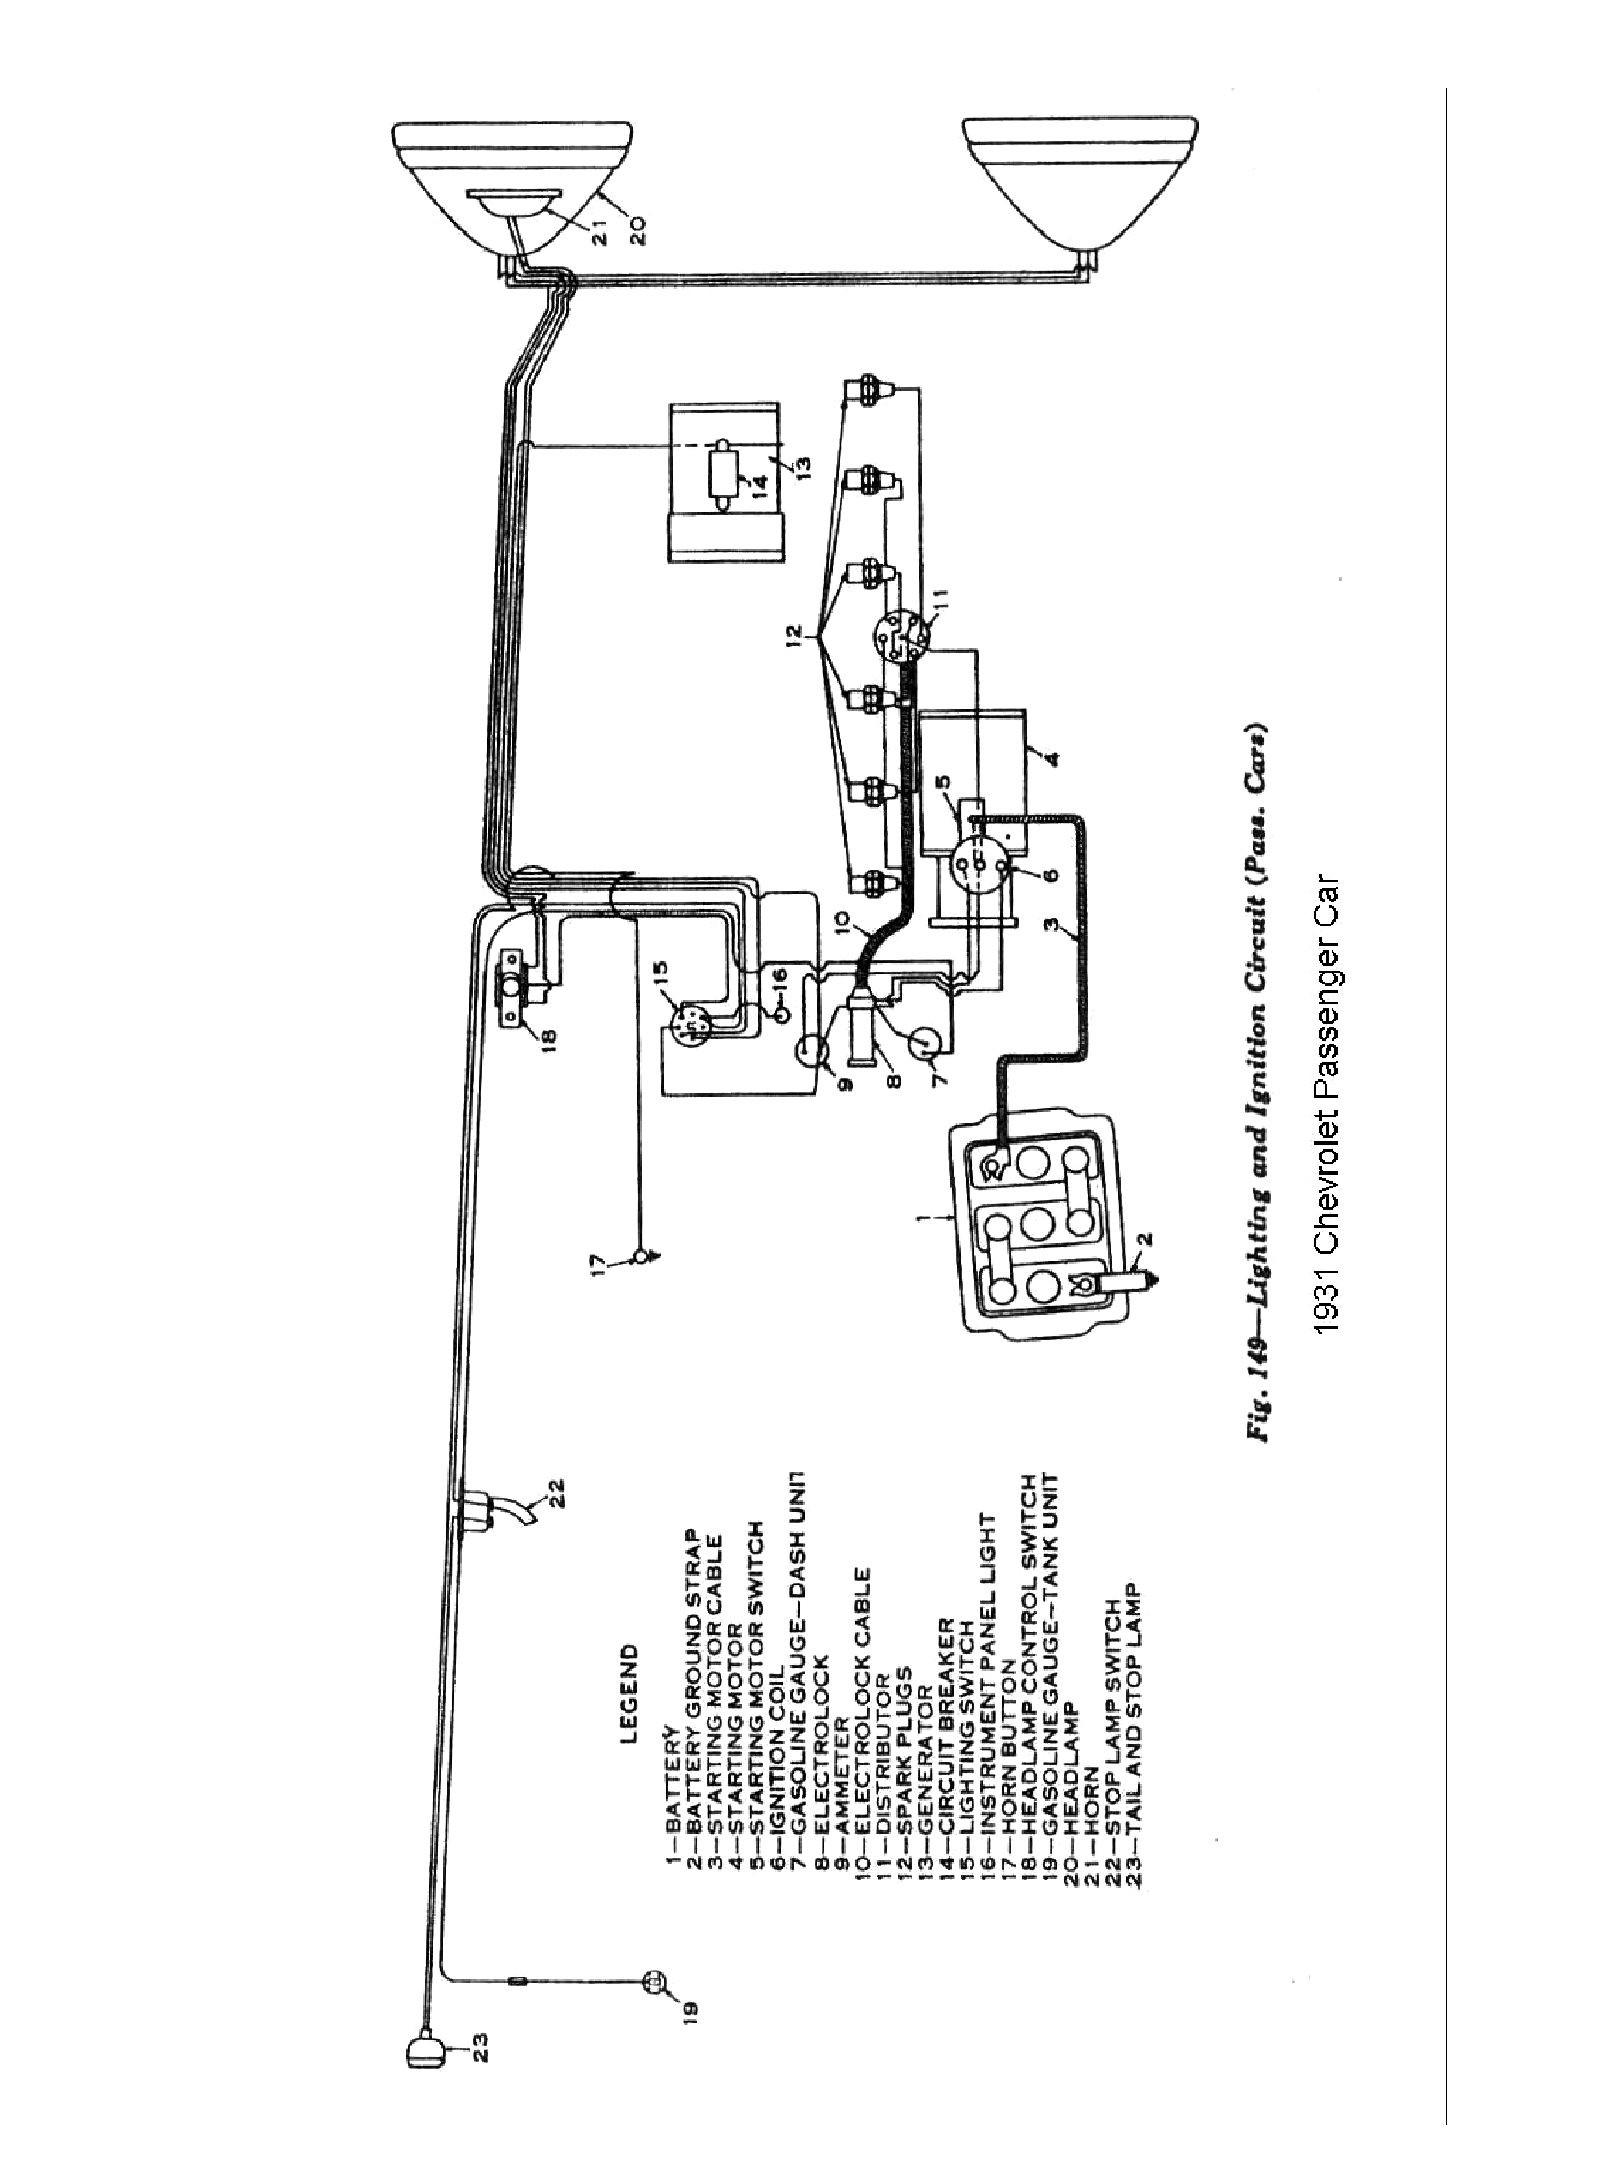 hight resolution of dolphin gauges wiring diagram 10 11 stromoeko de u2022dolphin tach wiring diagram wiring diagram rh